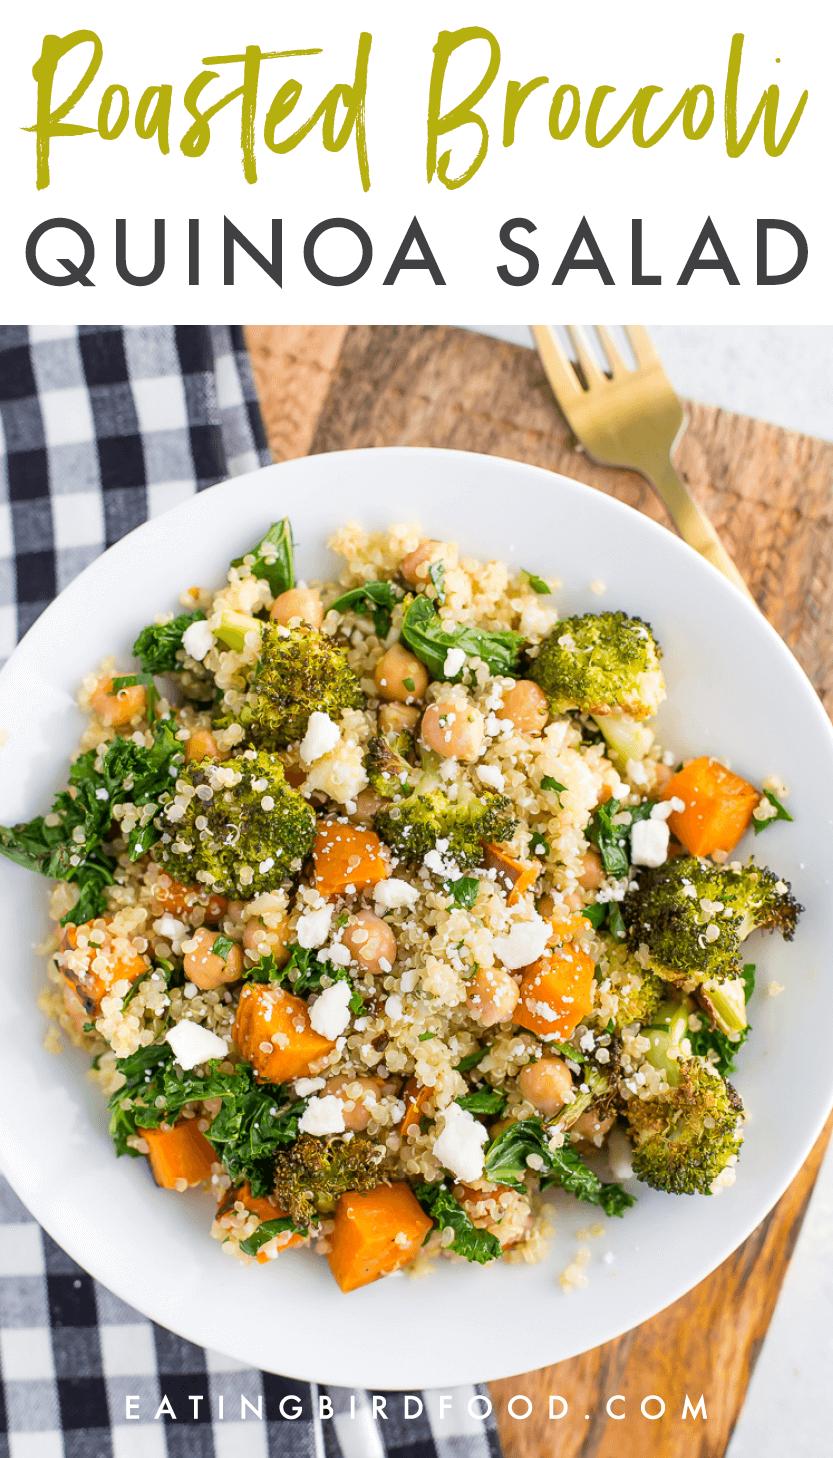 Roasted Broccoli Quinoa Salad Eating Bird Food Recipe Vegetarian Recipes Healthy Recipes Healthy